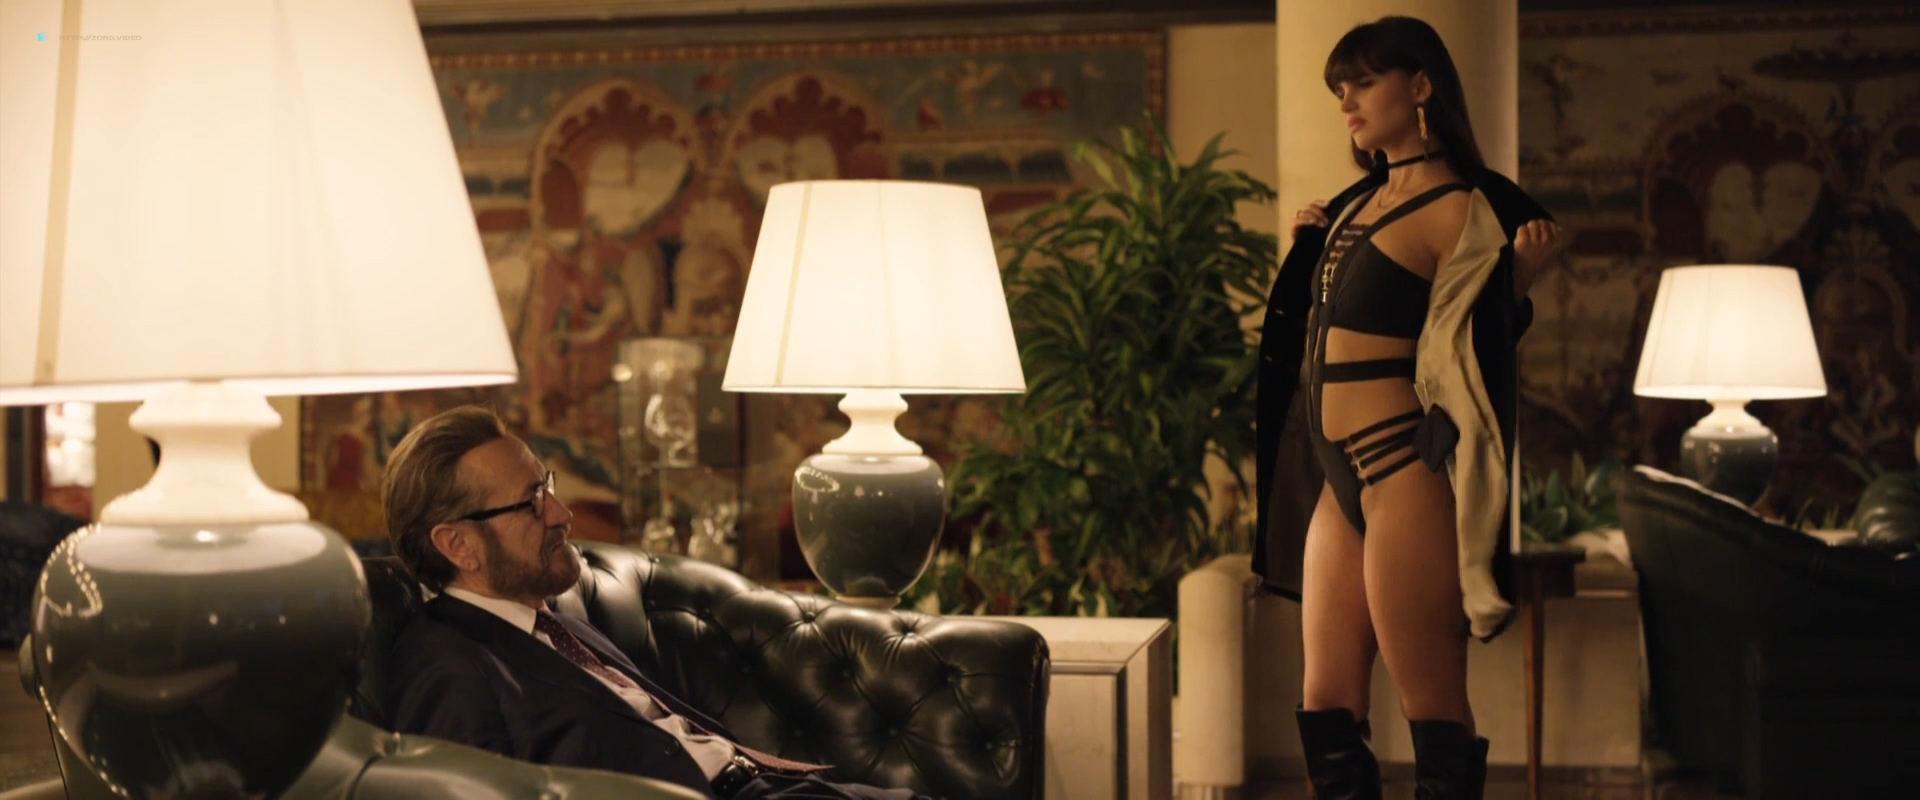 Simonetta Columbu nude topless Sara Deghdak and others hot - Io sono Tempesta (IT-2018) HD 1080p (9)